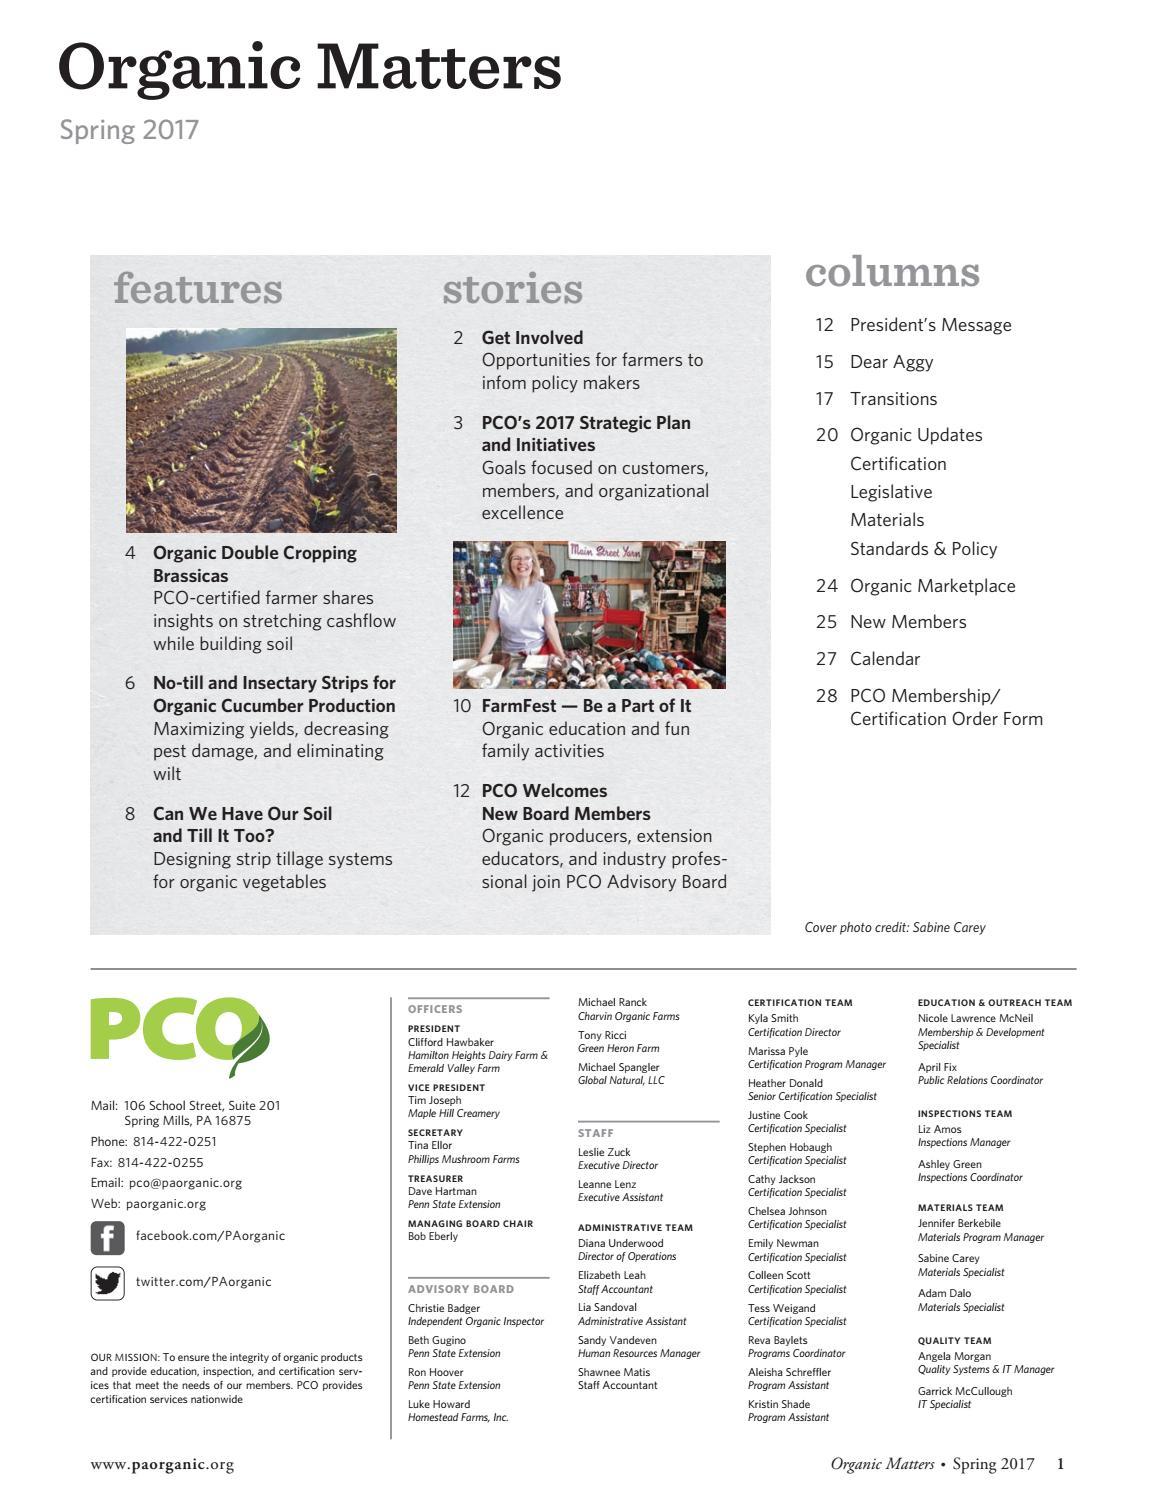 Organic Matters Spring 2017 By Pennsylvania Certified Organic Issuu